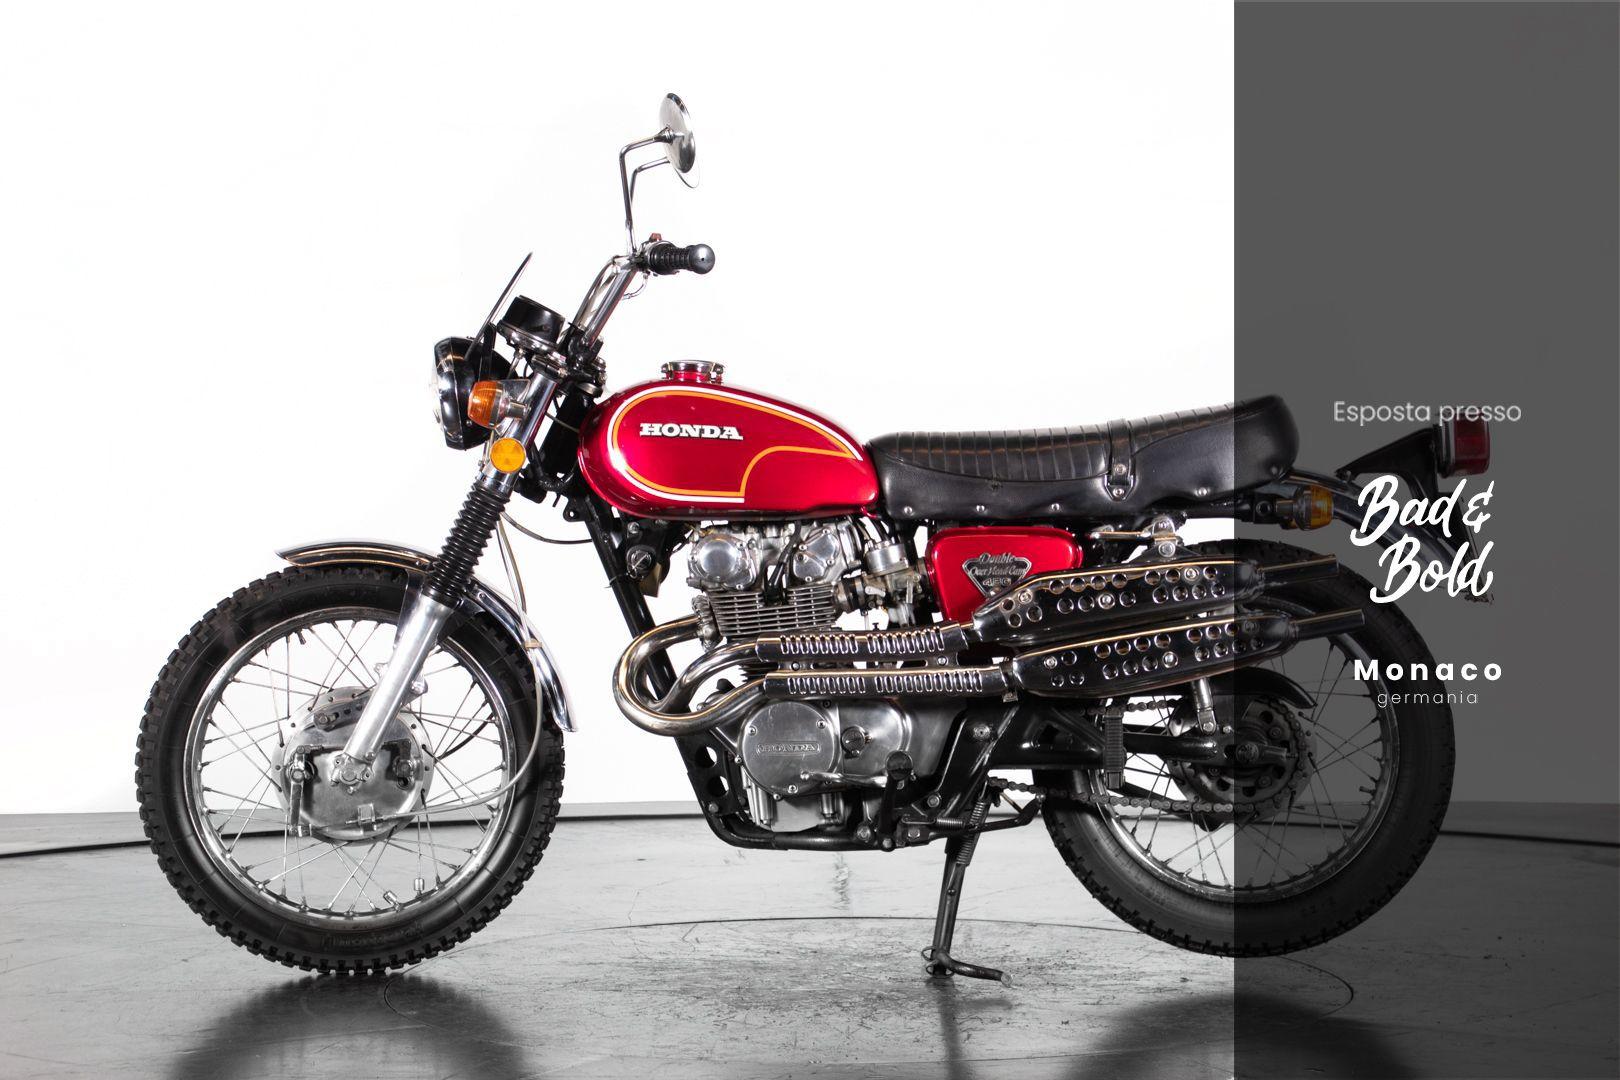 1972 HONDA CL 450 82222